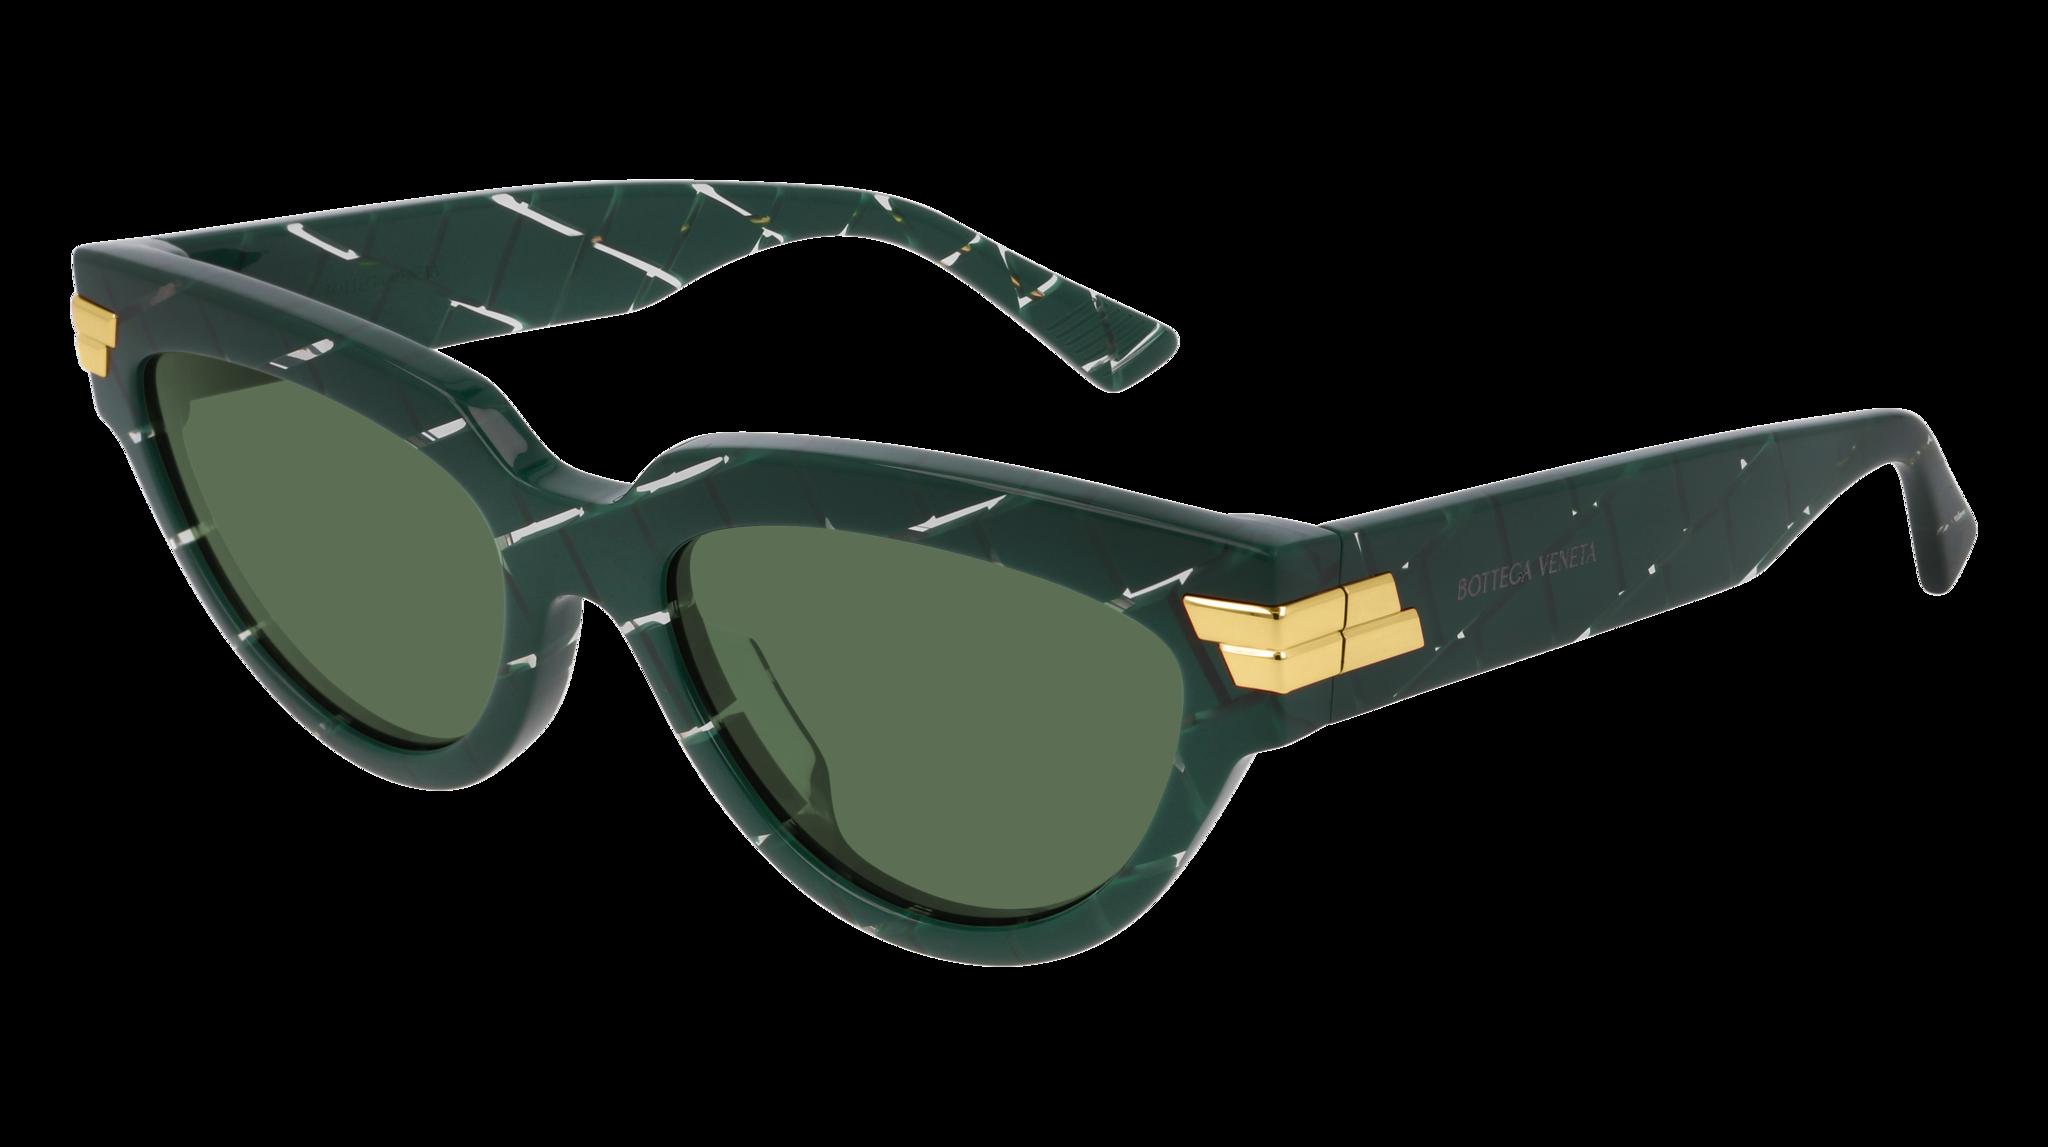 Bottega Veneta - BV1035S - 4-1